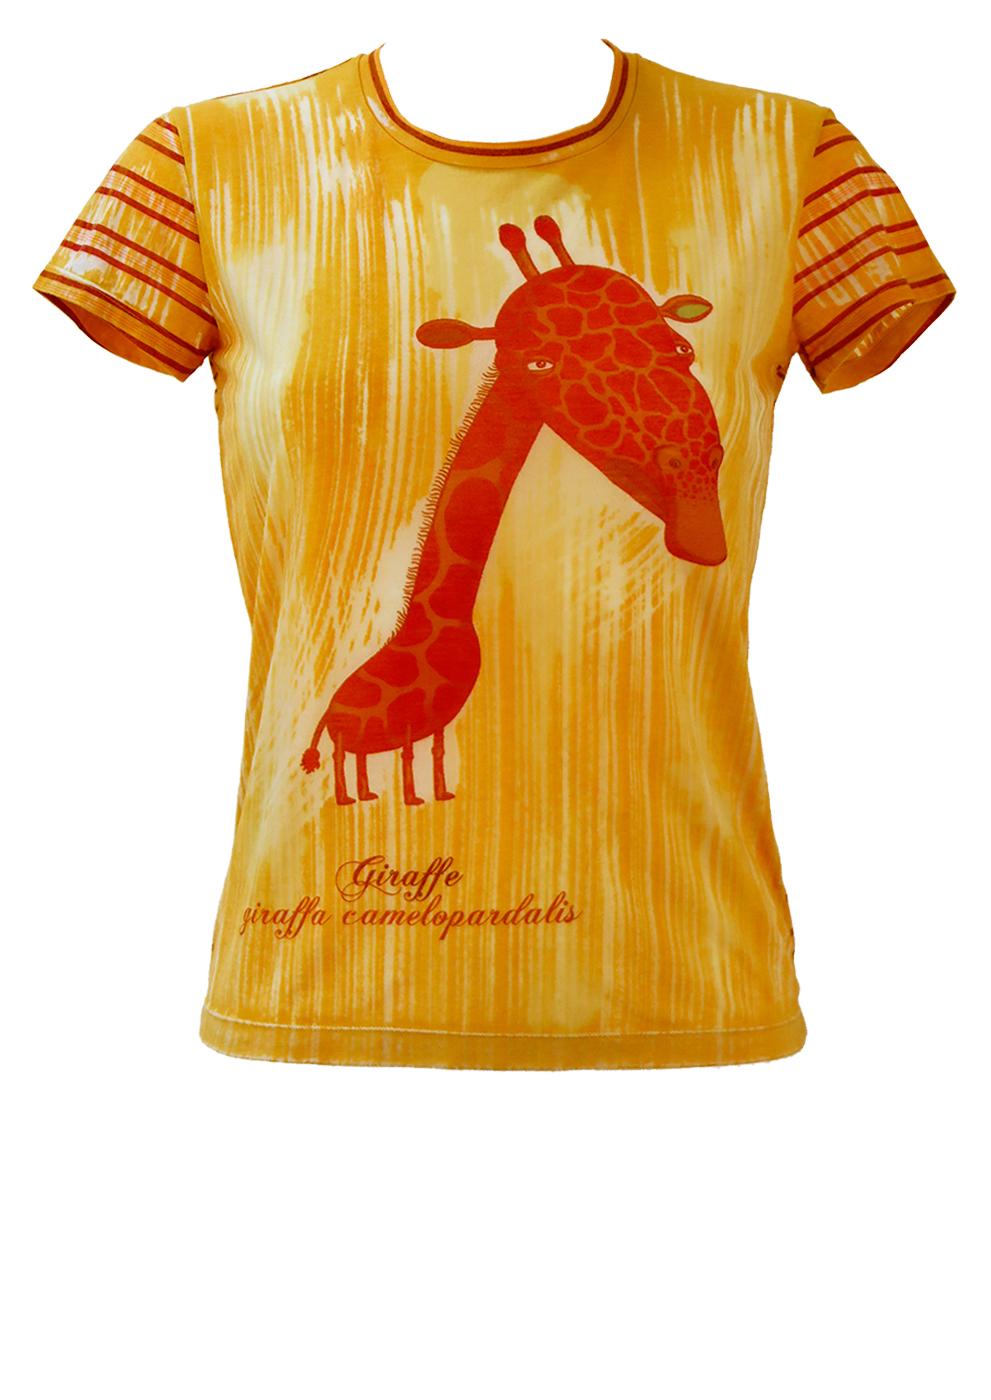 19e4bee8 Custo Giraffe Print T-shirt in Yellow, Ochre and Brown – S/M – Reign ...